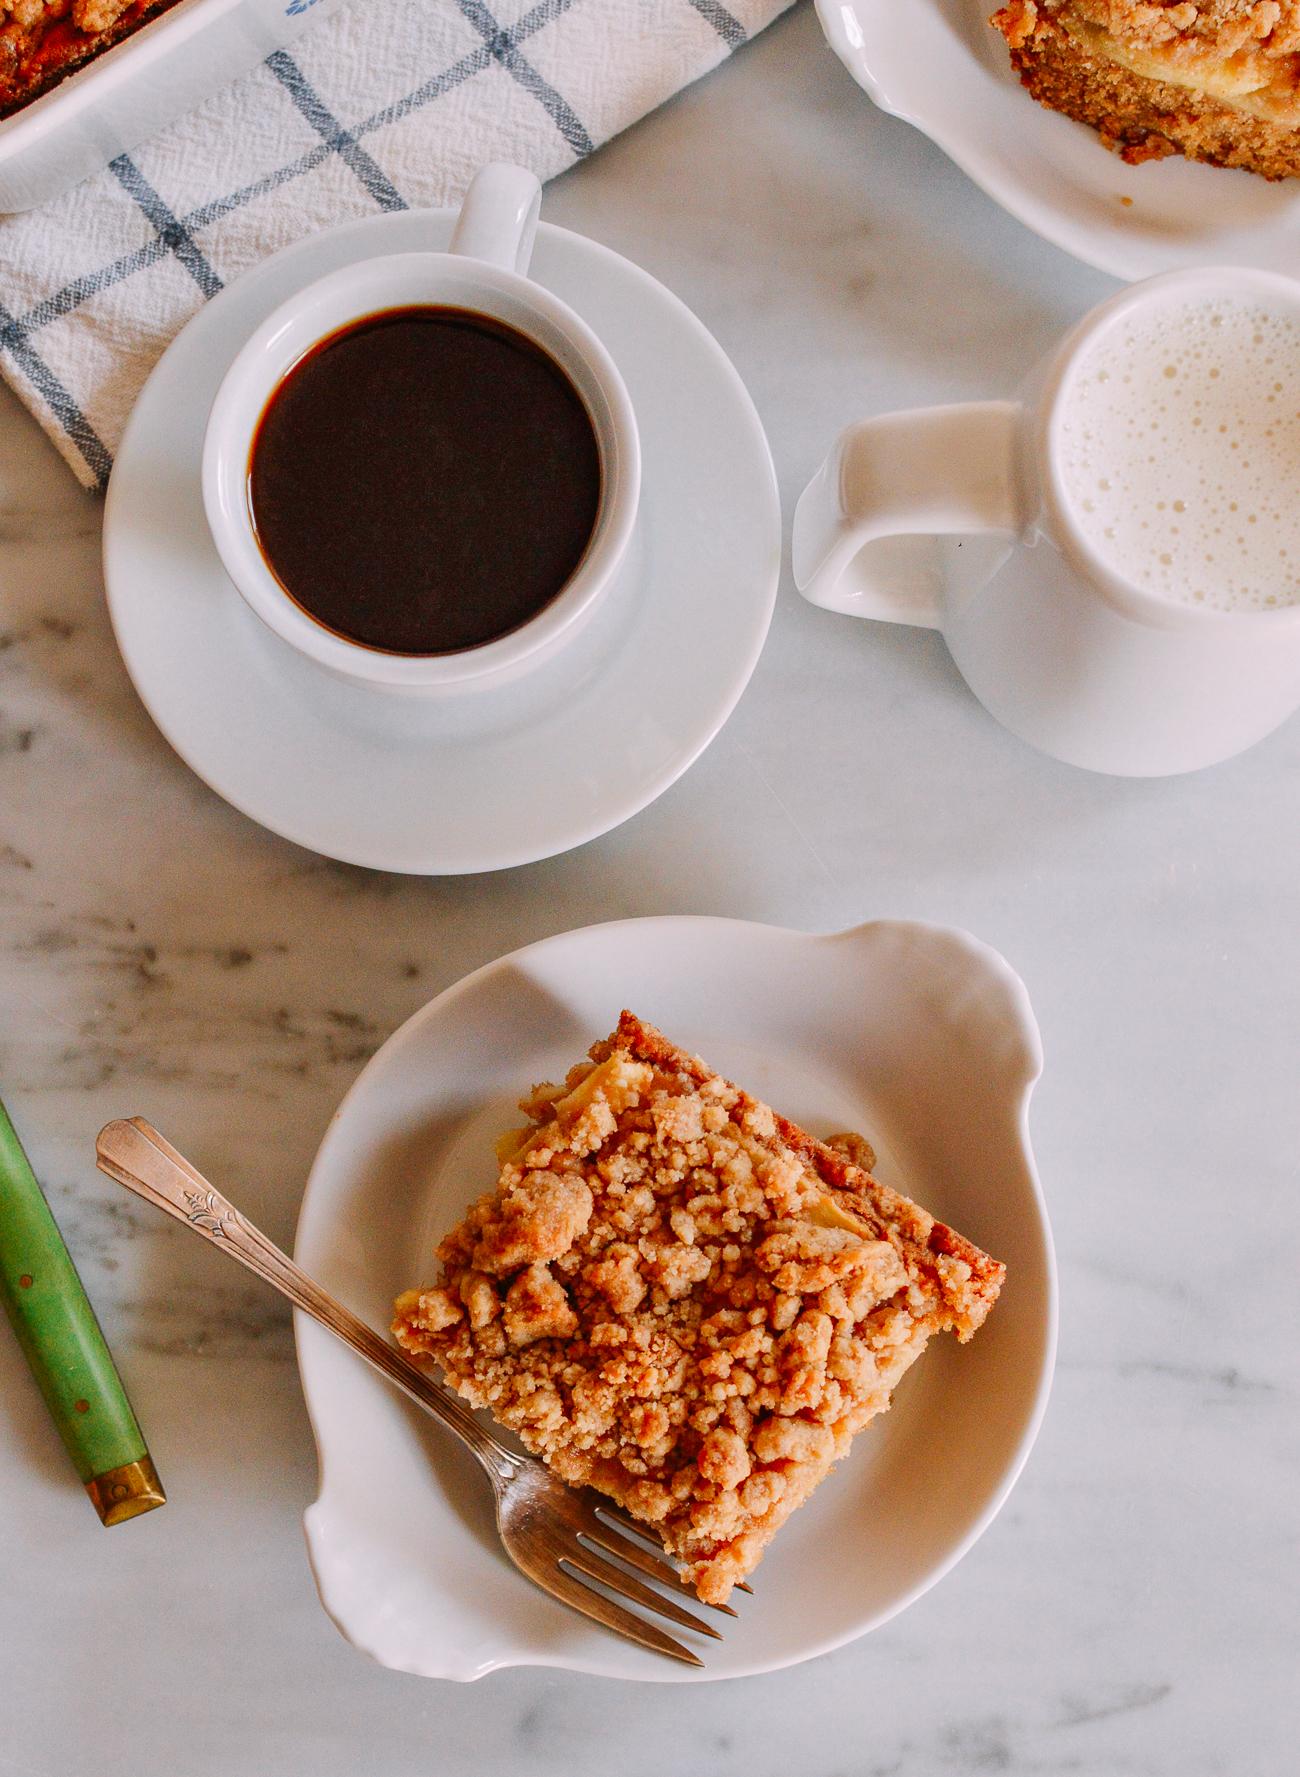 Apple cinnamon coffee cake with cup of coffee